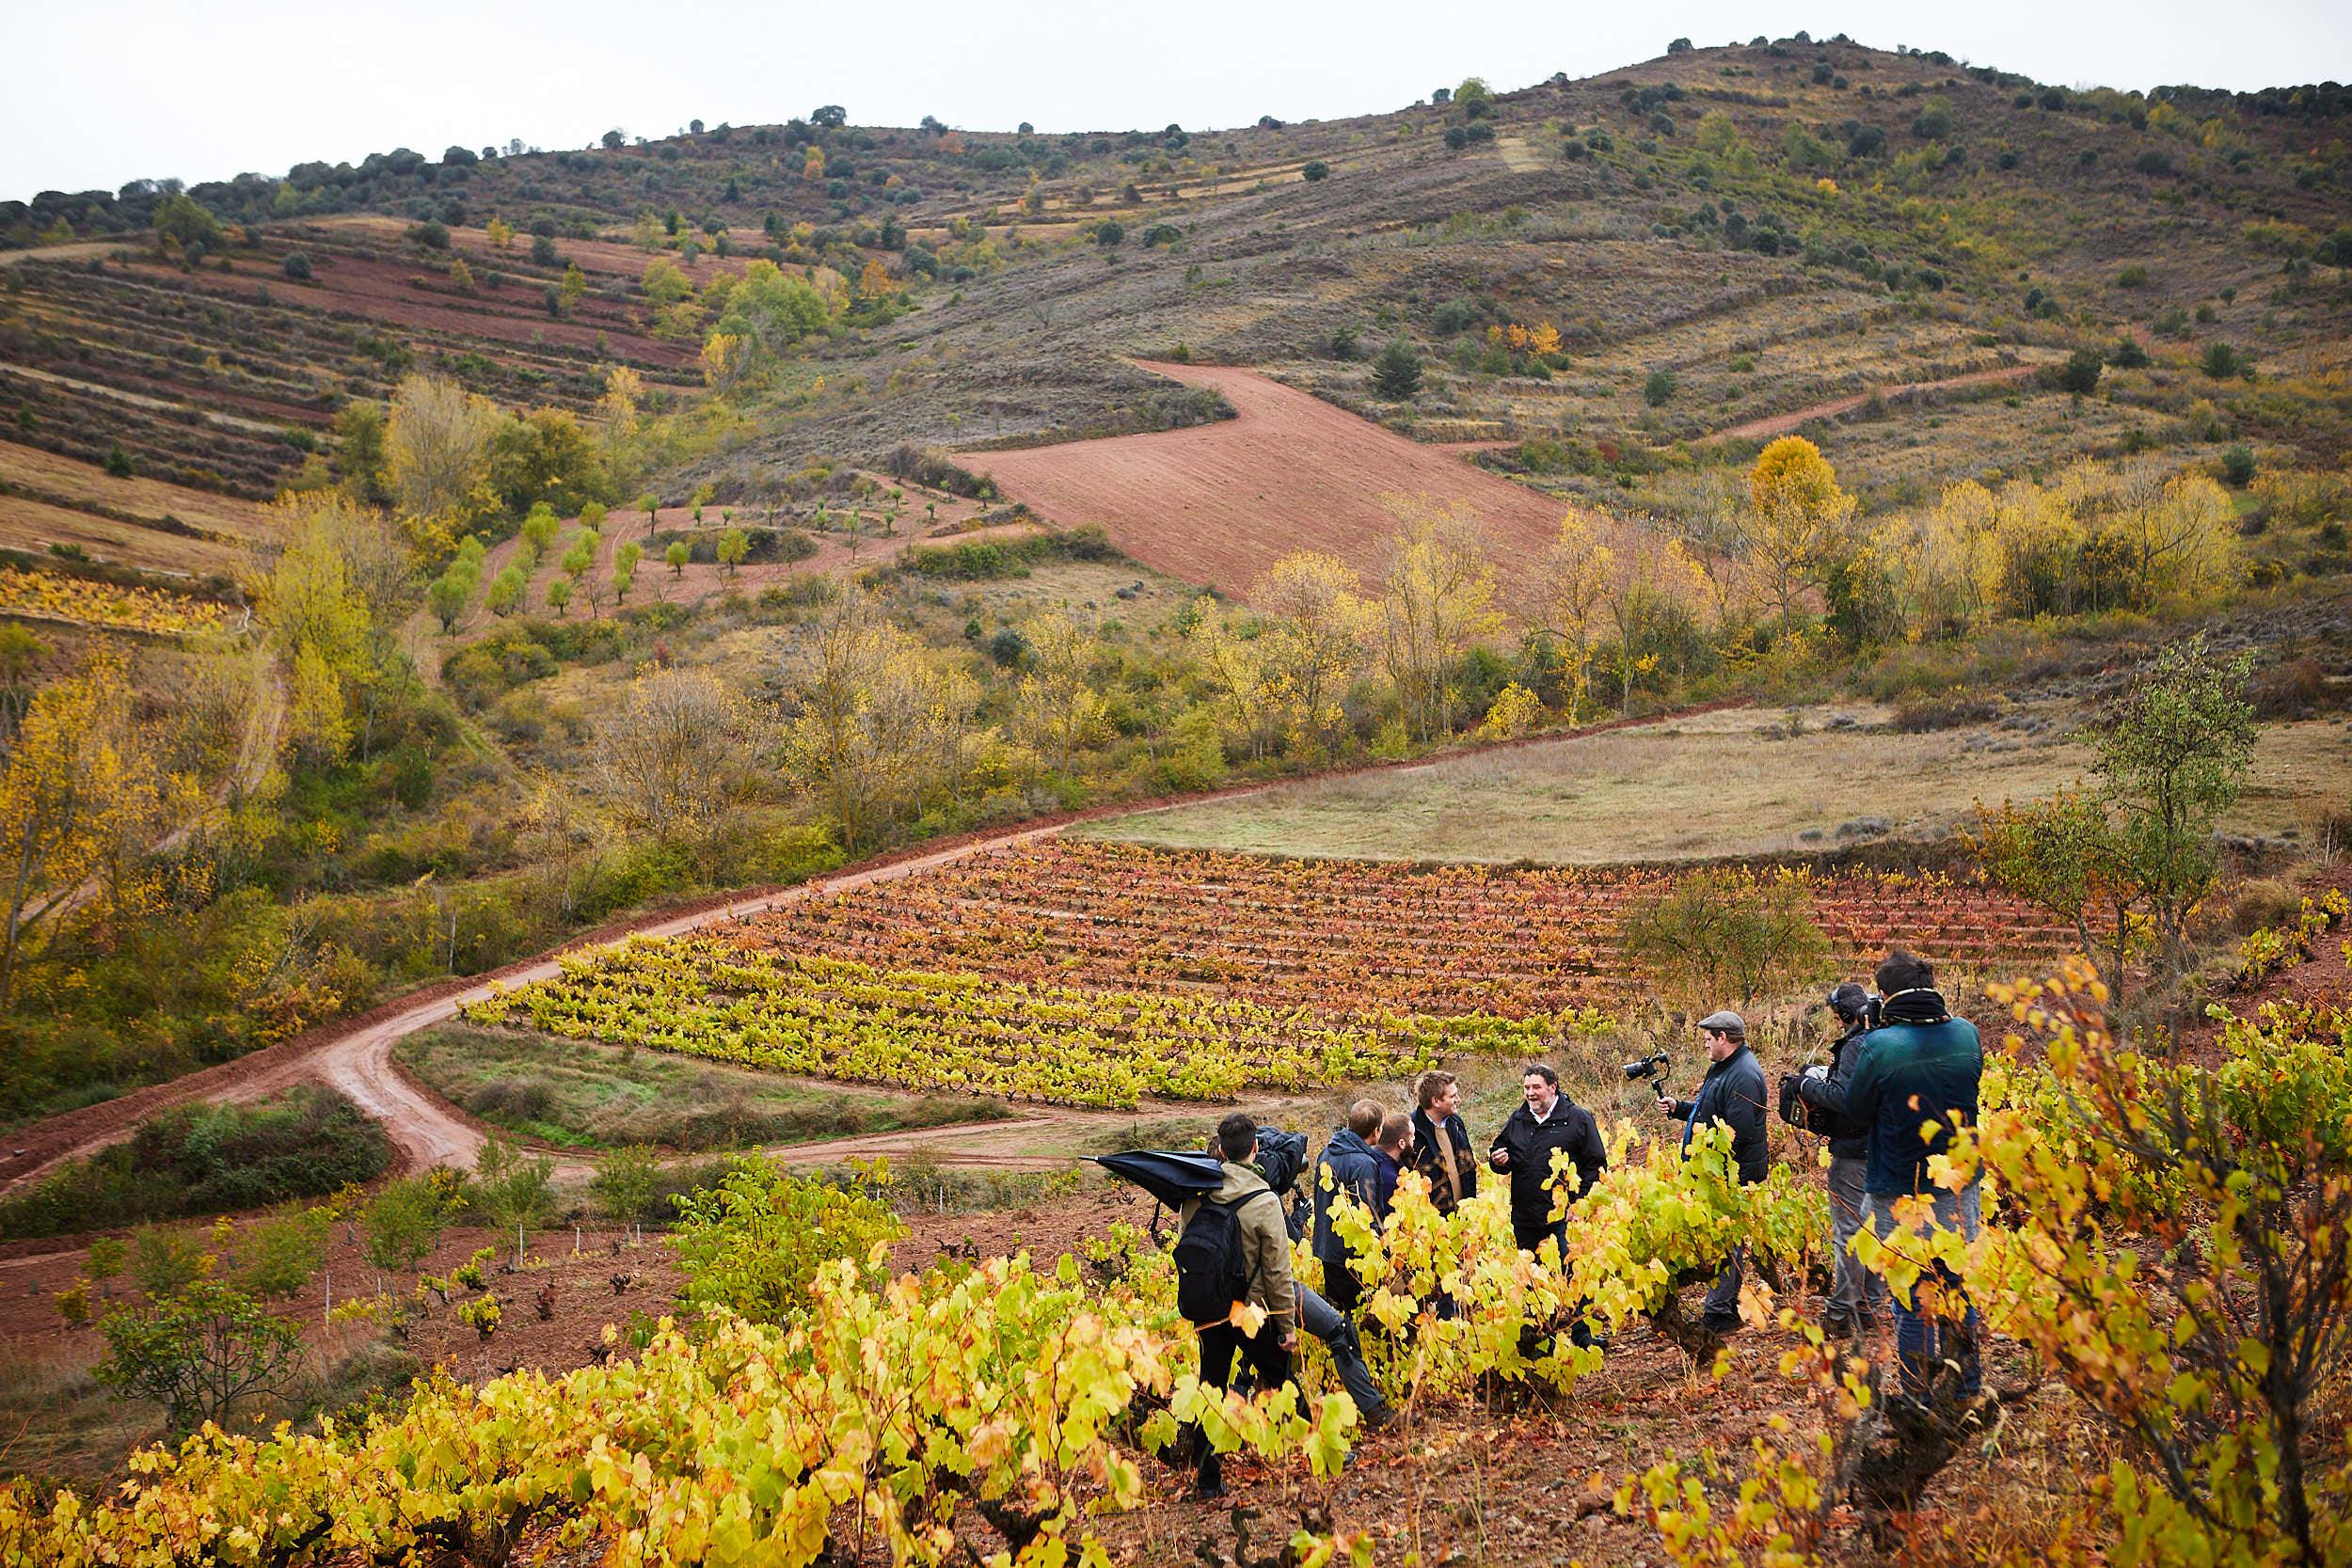 Professional_photographer_La_Rioja_Basque_Country_Spain_Chef_Curtis_Stone_Sturcke_009.jpg